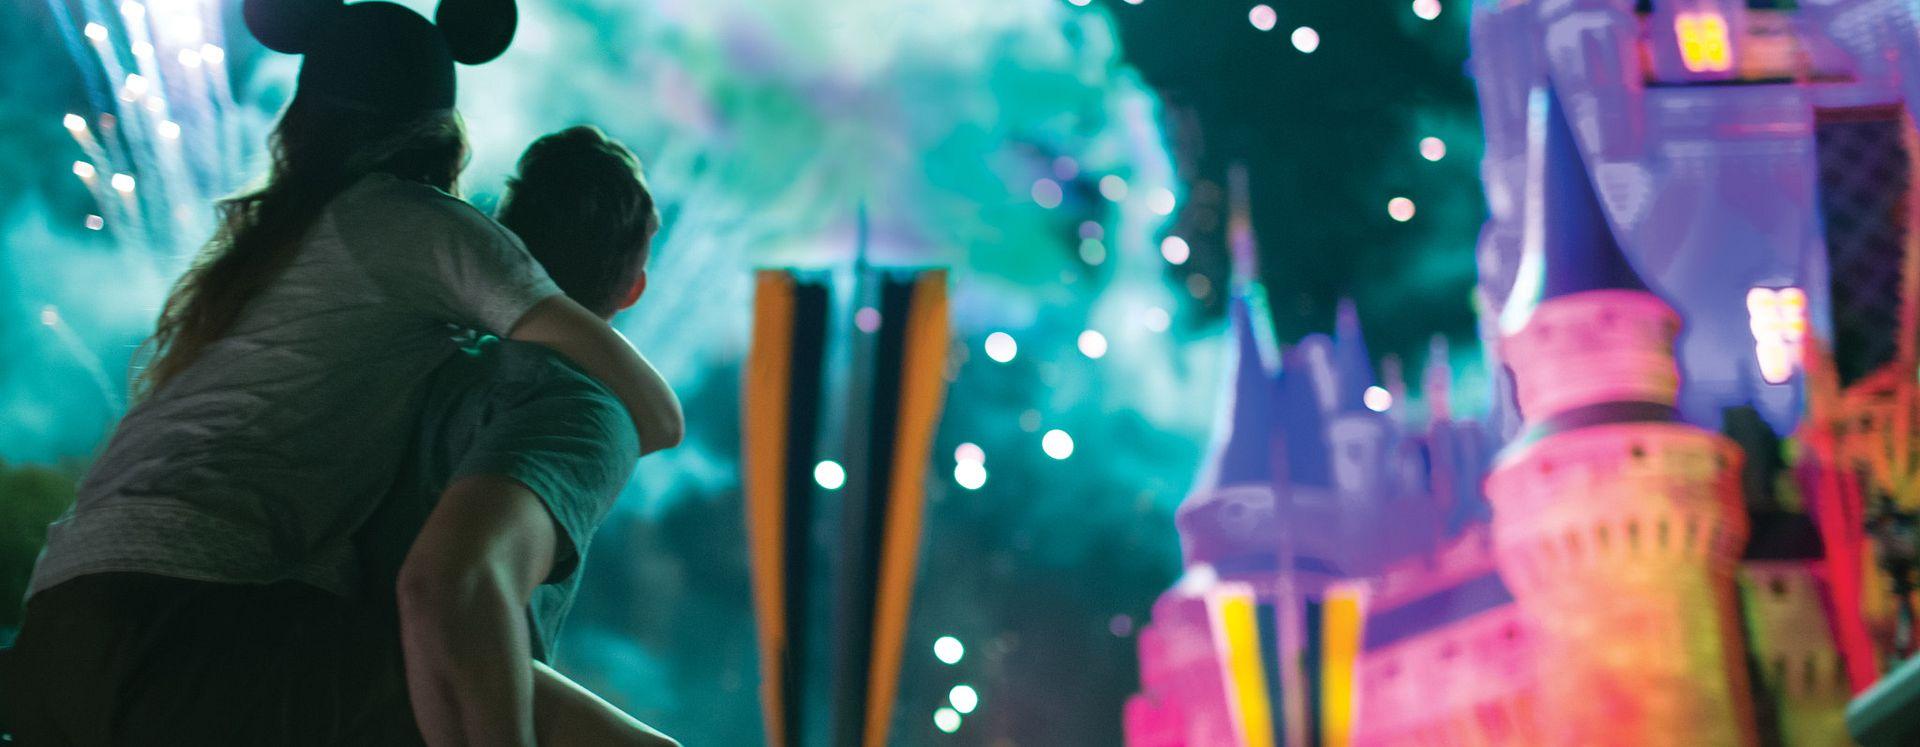 Parkgoers watching spectacular fireworks over Cinderella's Castle at Walt Disney World Resort